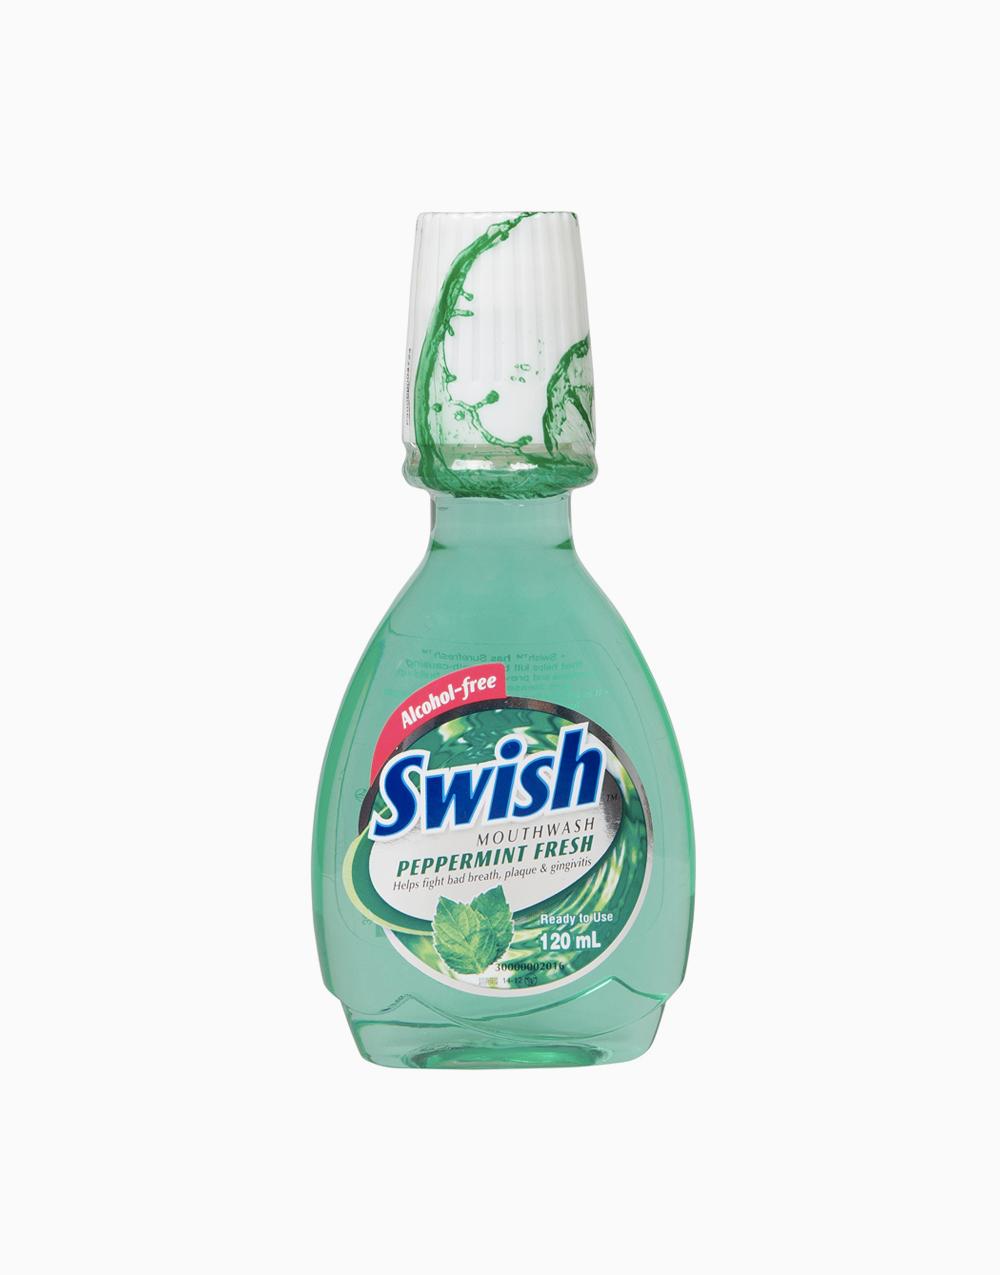 Swish Mouthwash (120ml) by Swish   Peppermint Fresh